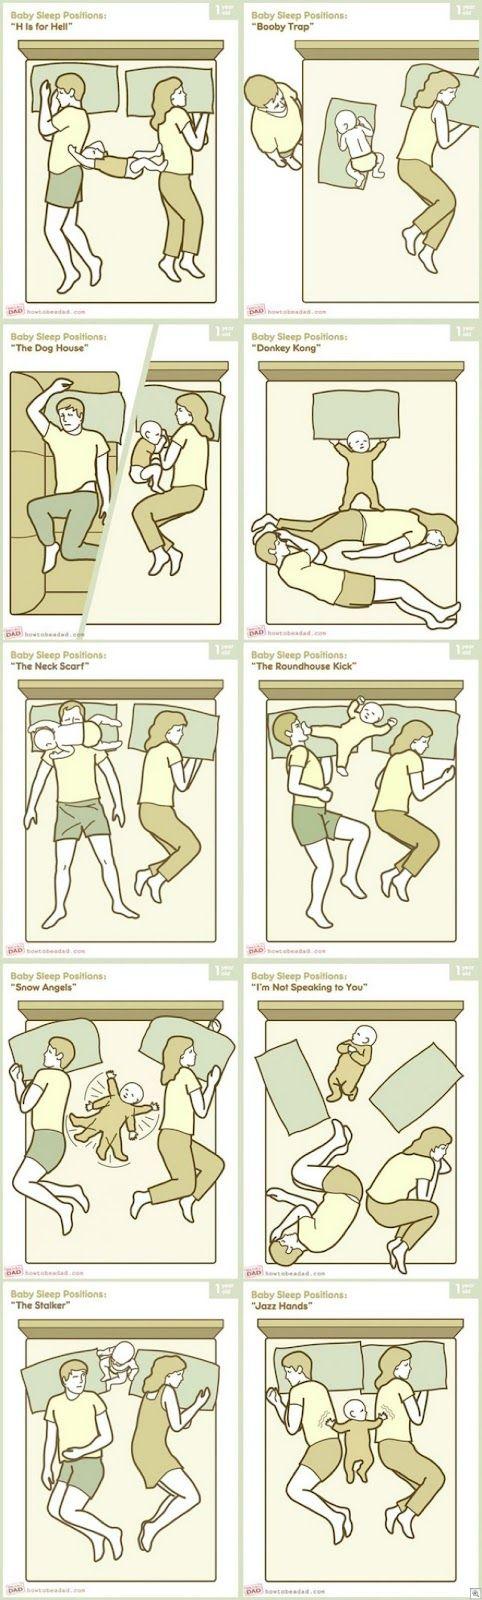 baby sleeping positions